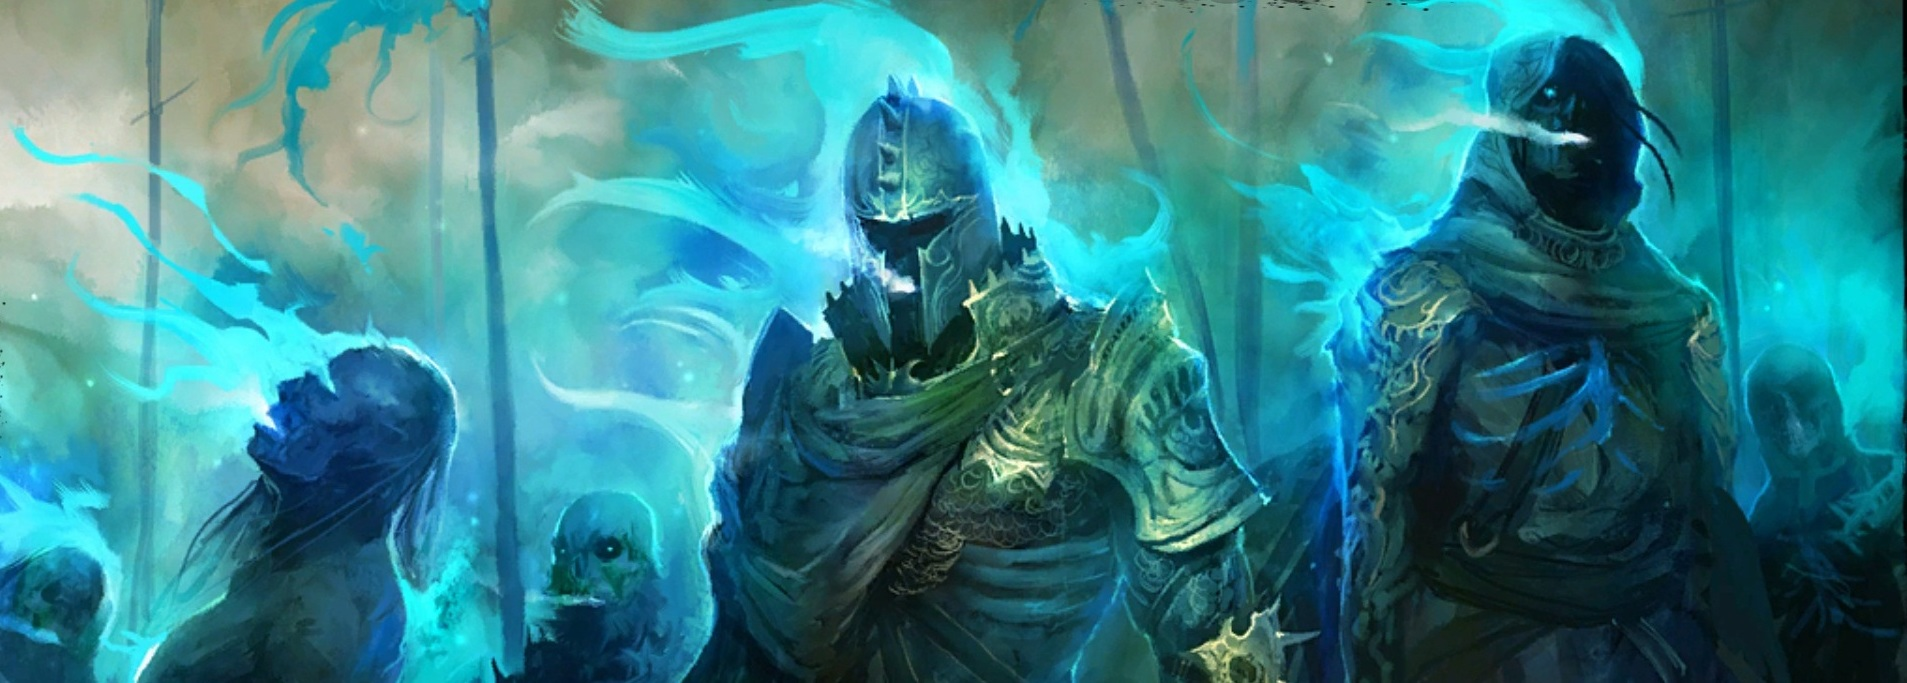 Photo of Dungeon-Guide – Katakomben von Ascalon – Erforschungs-Modus